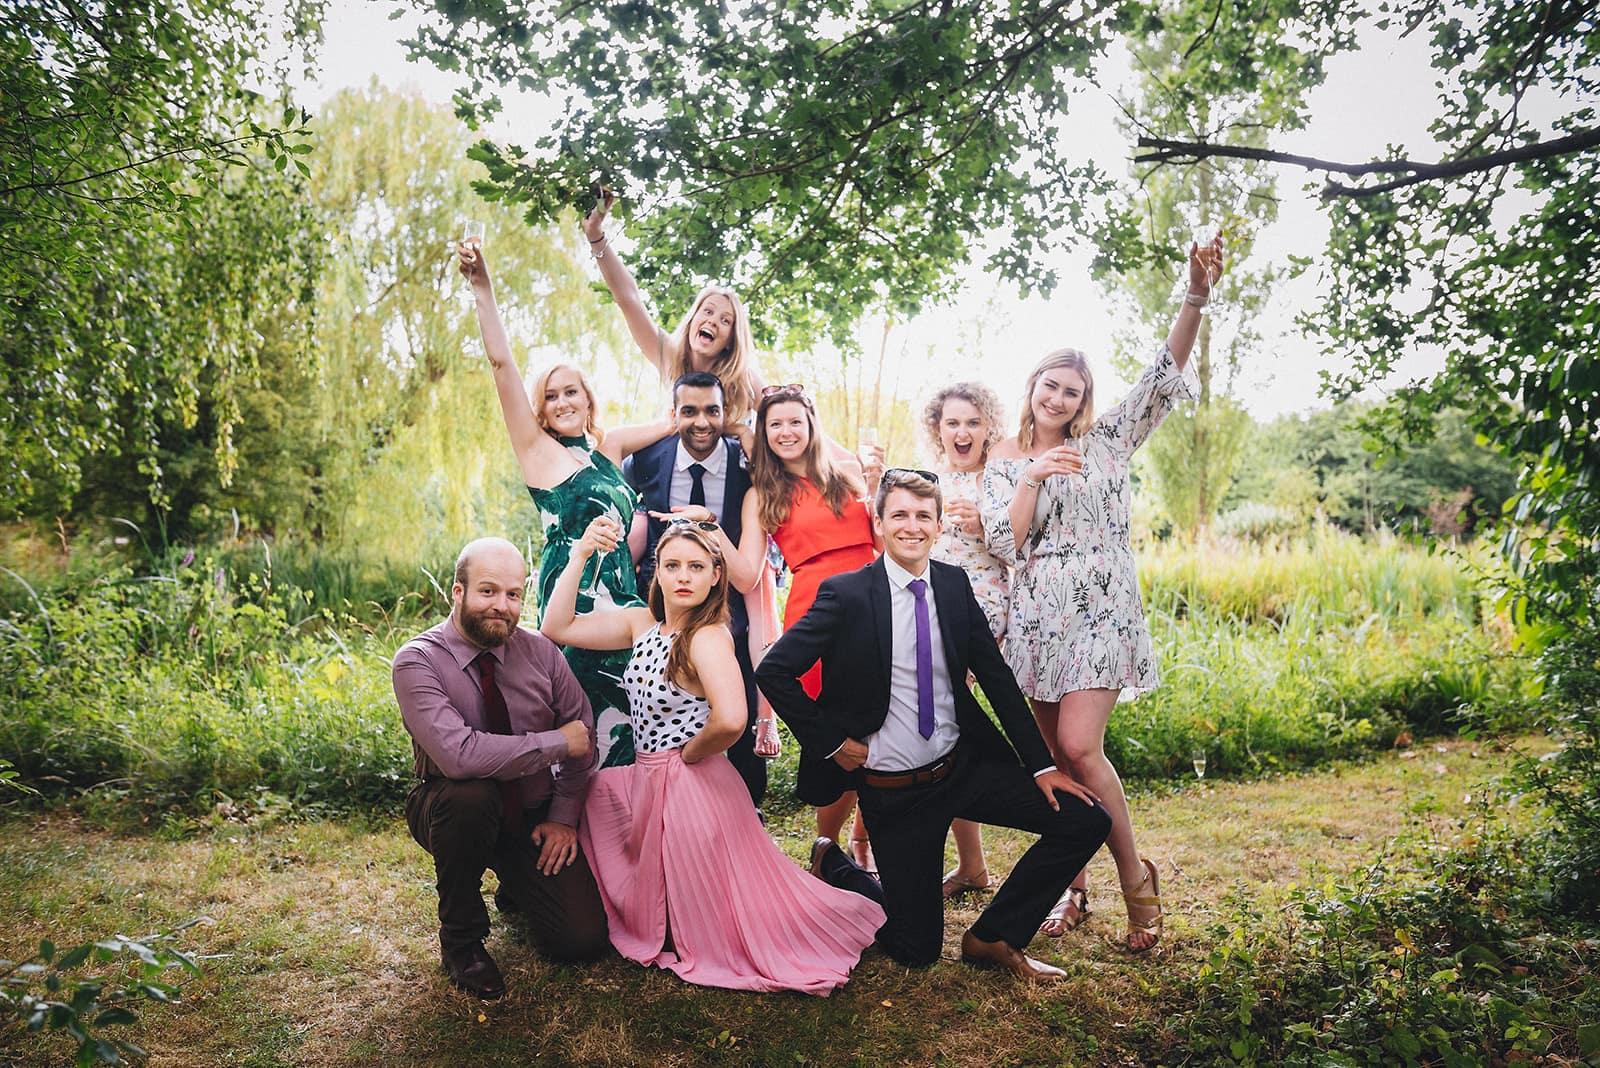 unposed fun natural wedding group shot